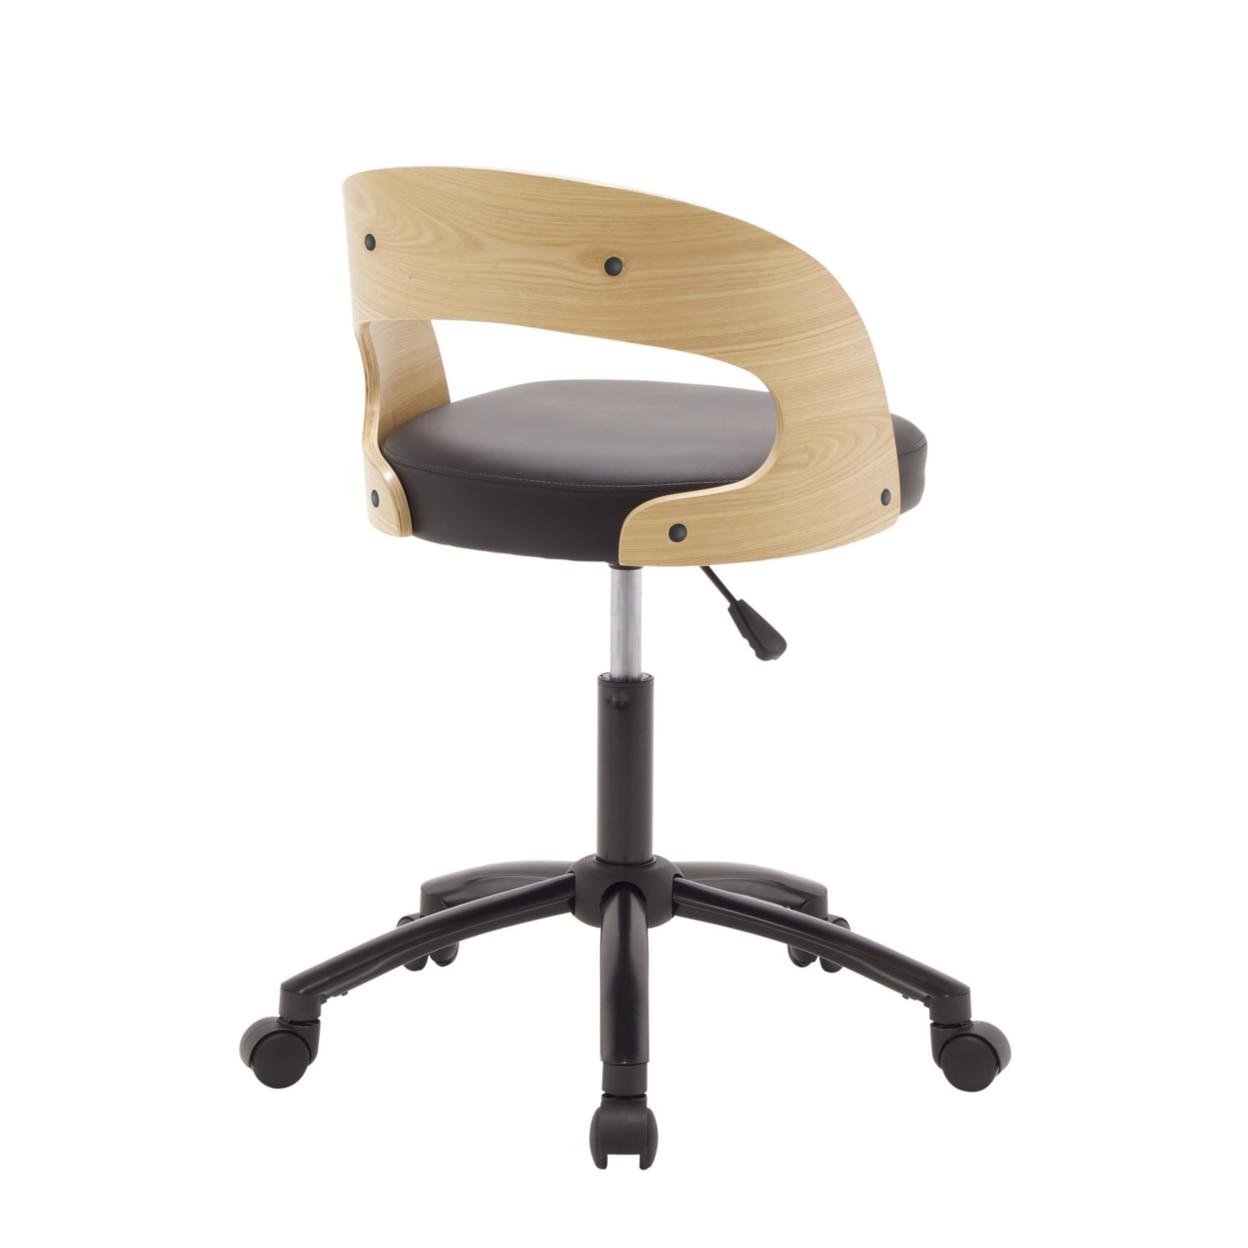 Studio Designs Home Office Ashwood Chair - Black/Ashwood